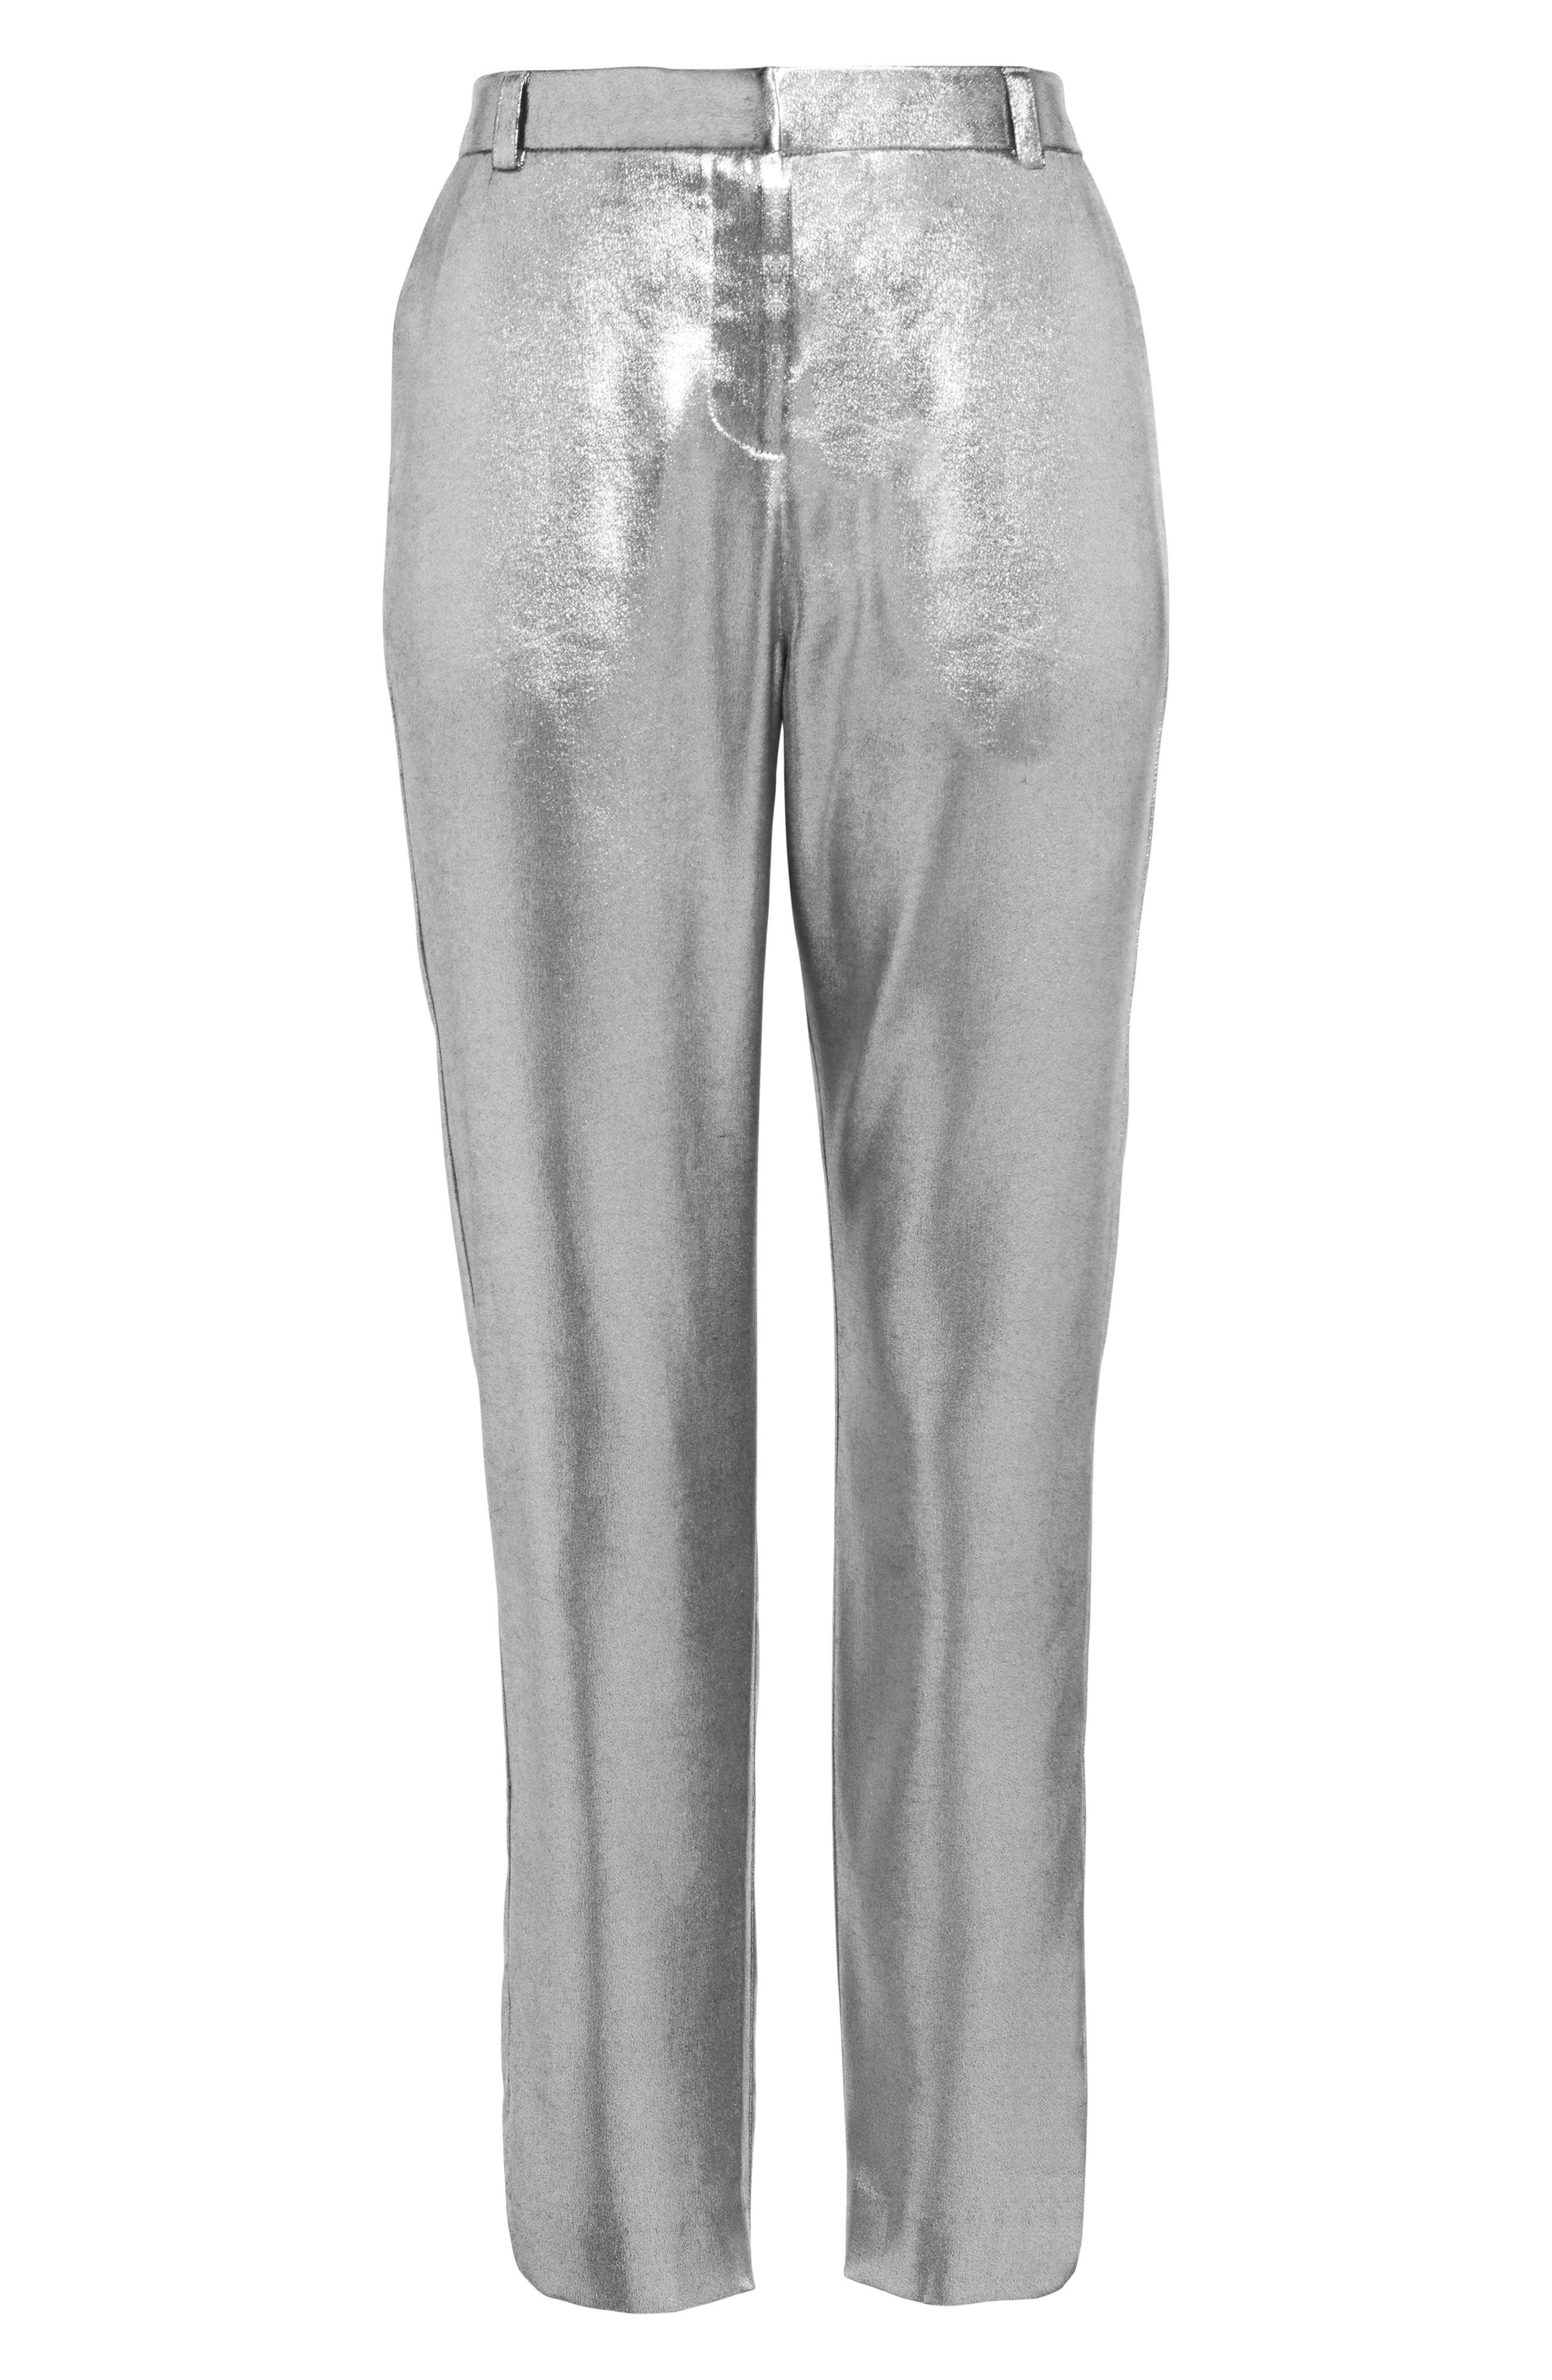 Metallic Suit Trousers,                             Alternate thumbnail 7, color,                             Silver